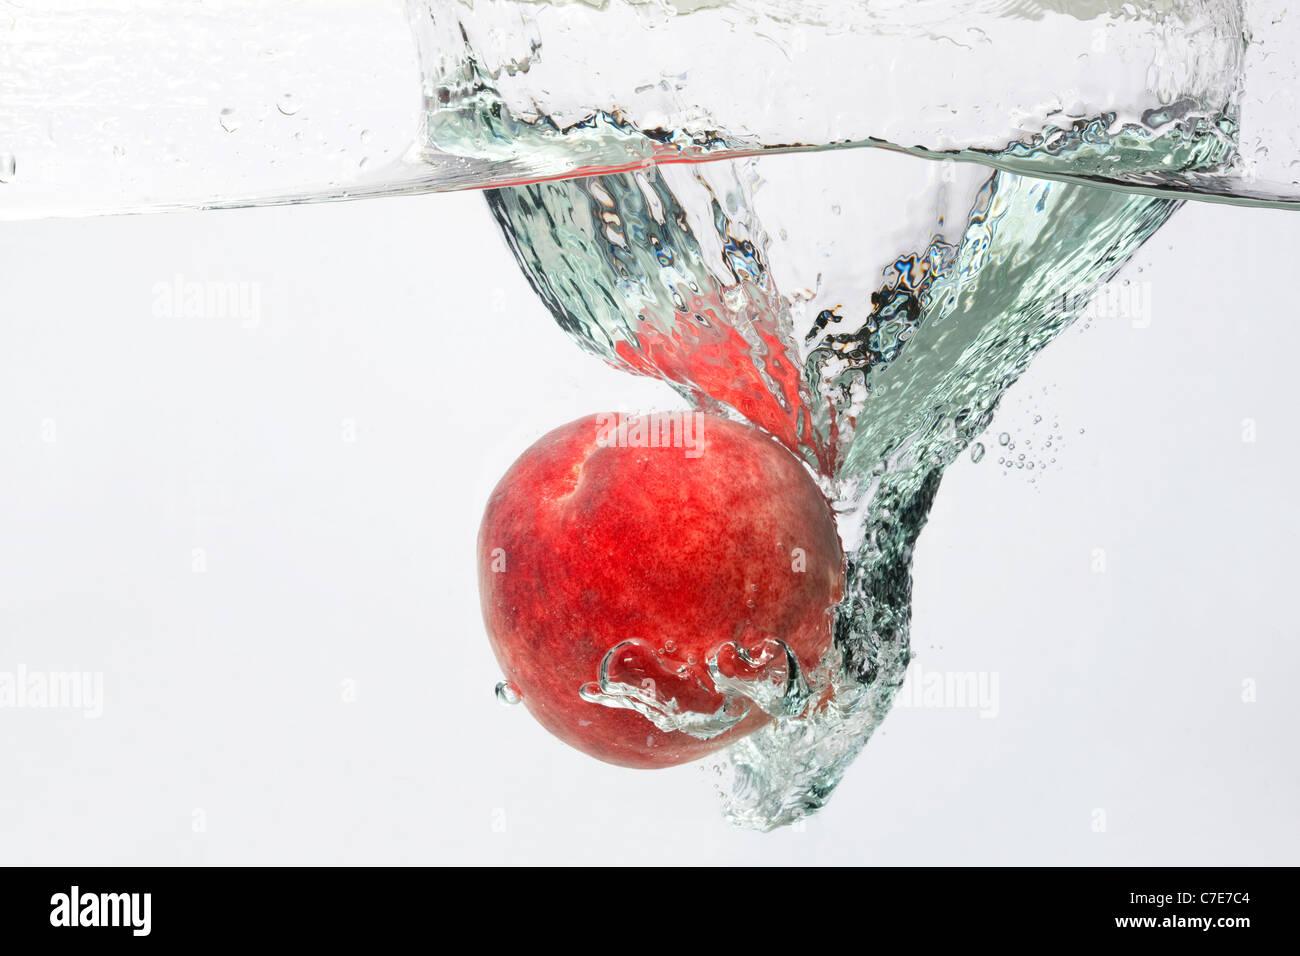 Peach Splashing in Water - Stock Image